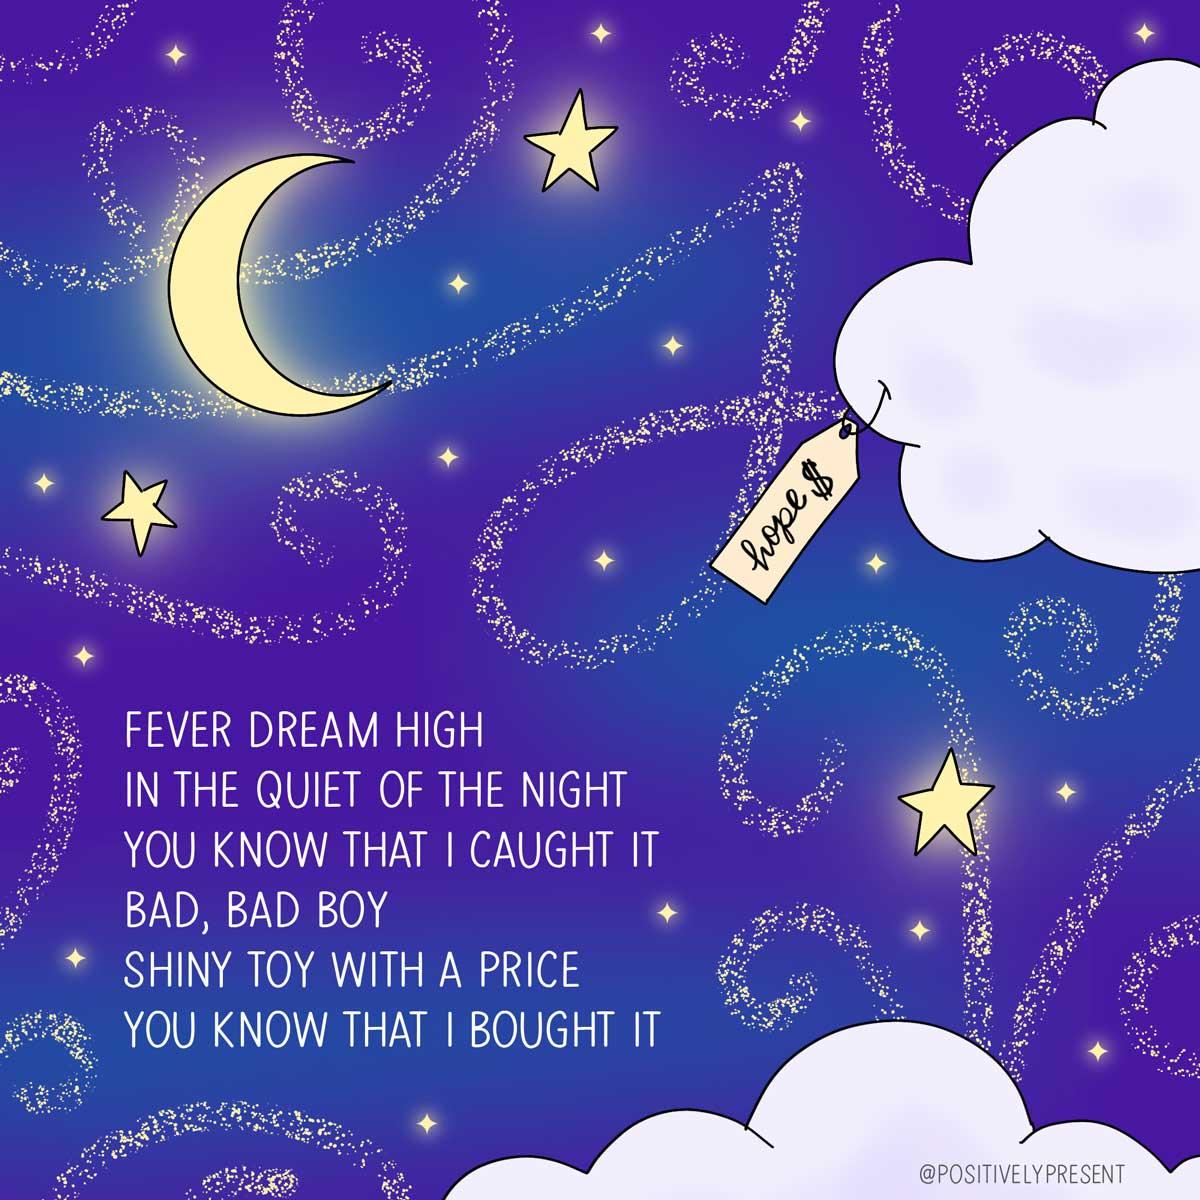 cruel summer taylor swift lyrics on starry night sky artwork.